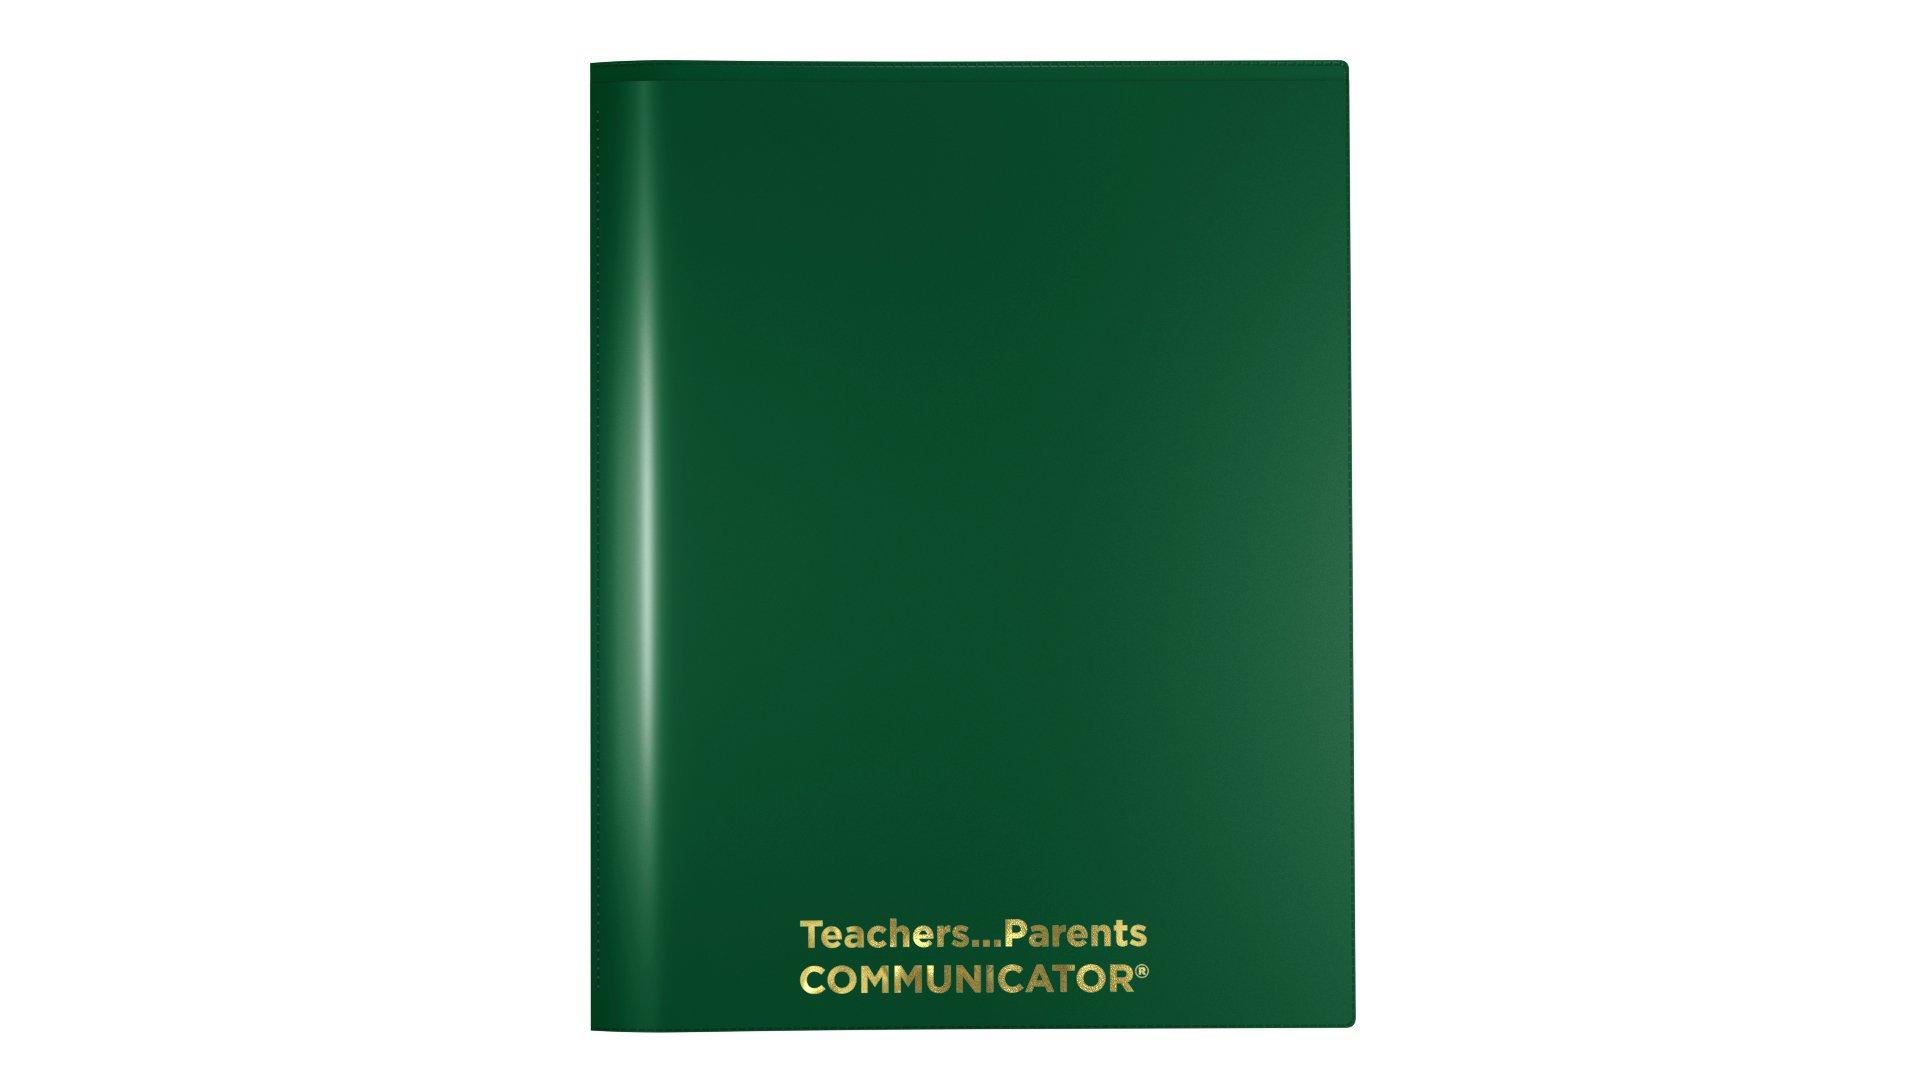 Nicky's Communicator Folder (Pack of 50), Flexible Plastic Folder for Letter Size Papers (Green) by Nicky's